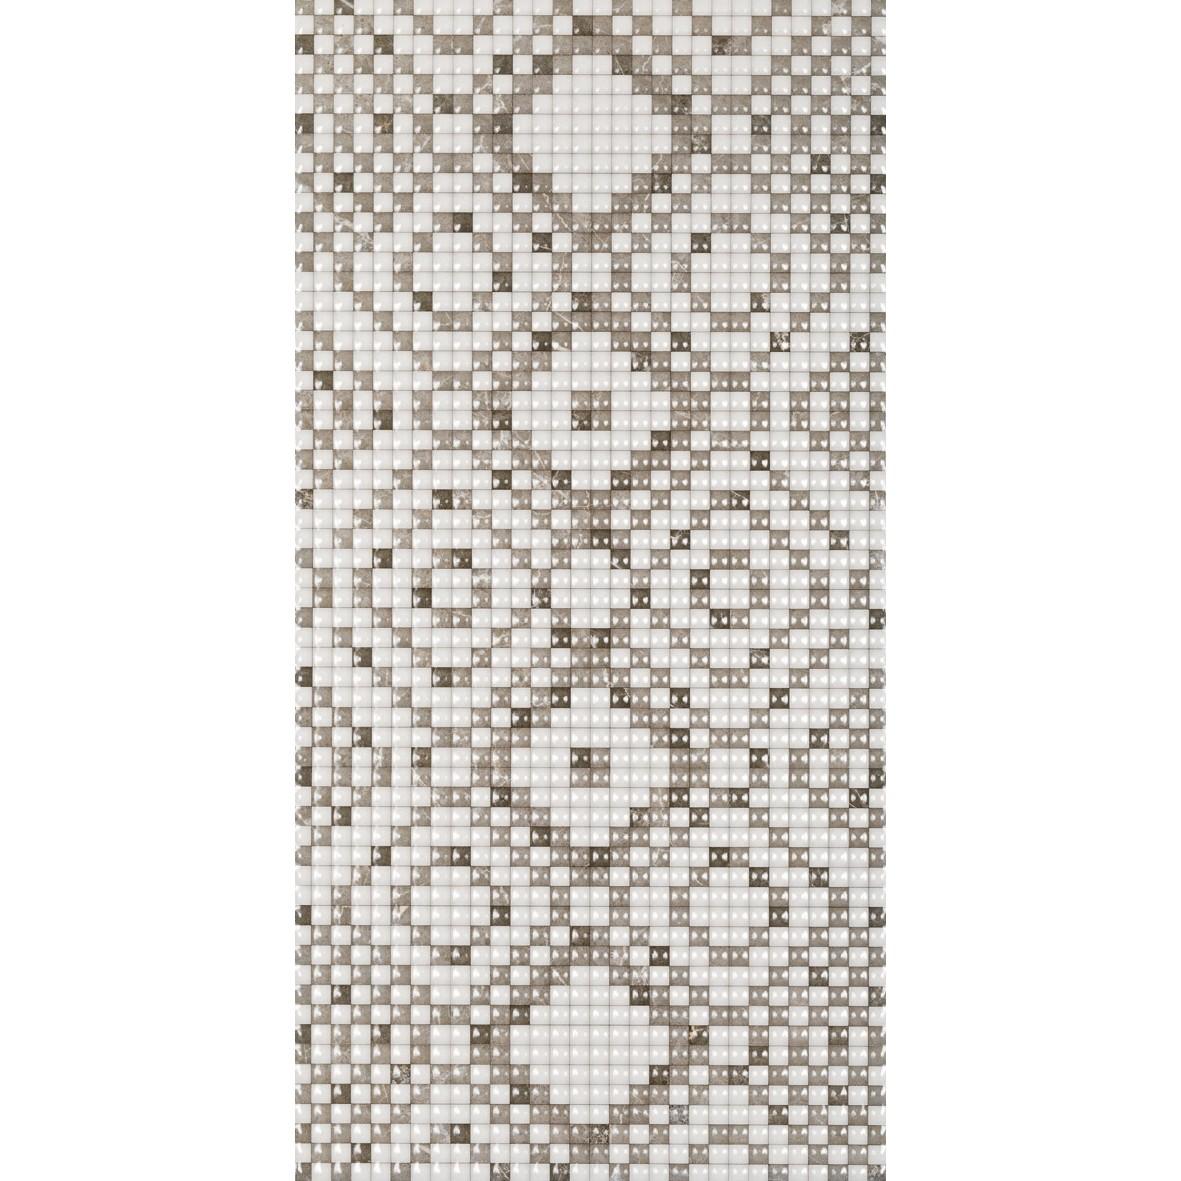 Ceramica Tom Bordado Brilhante HD Tipo A Borda Bold 30x60cm 237m Cinza Claro - Pointer